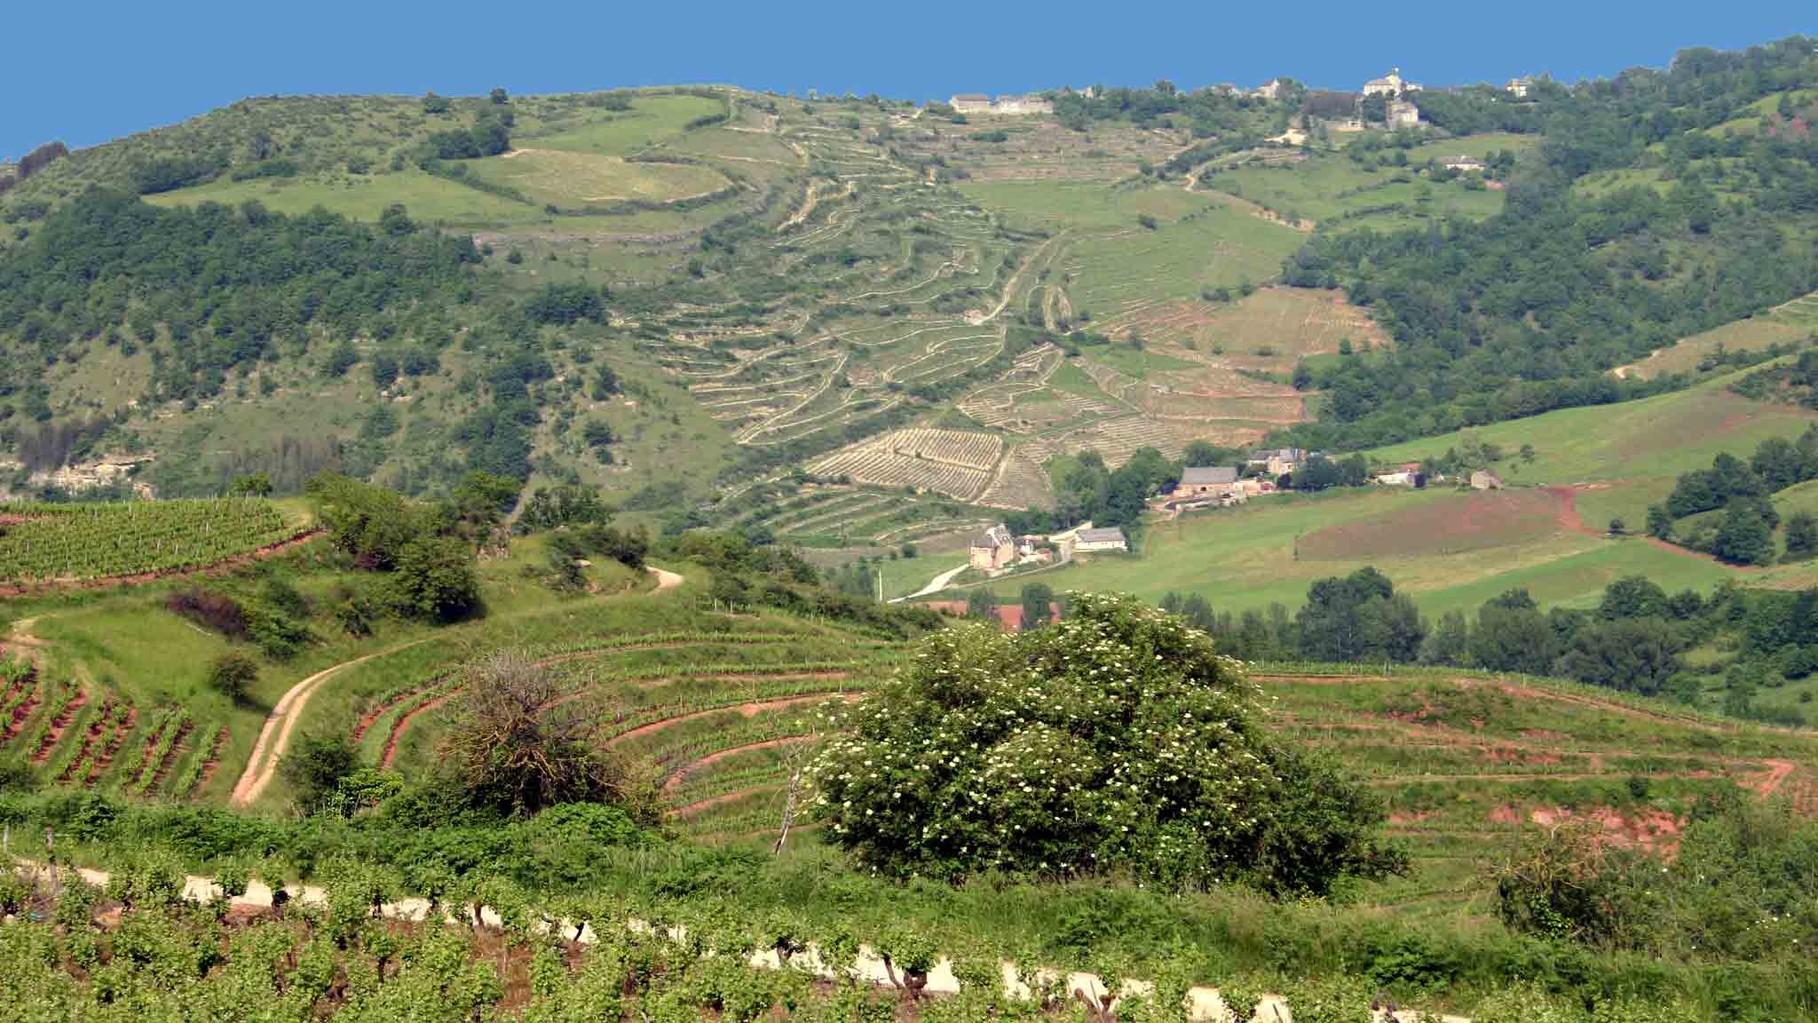 Le vignoble de Marcillac